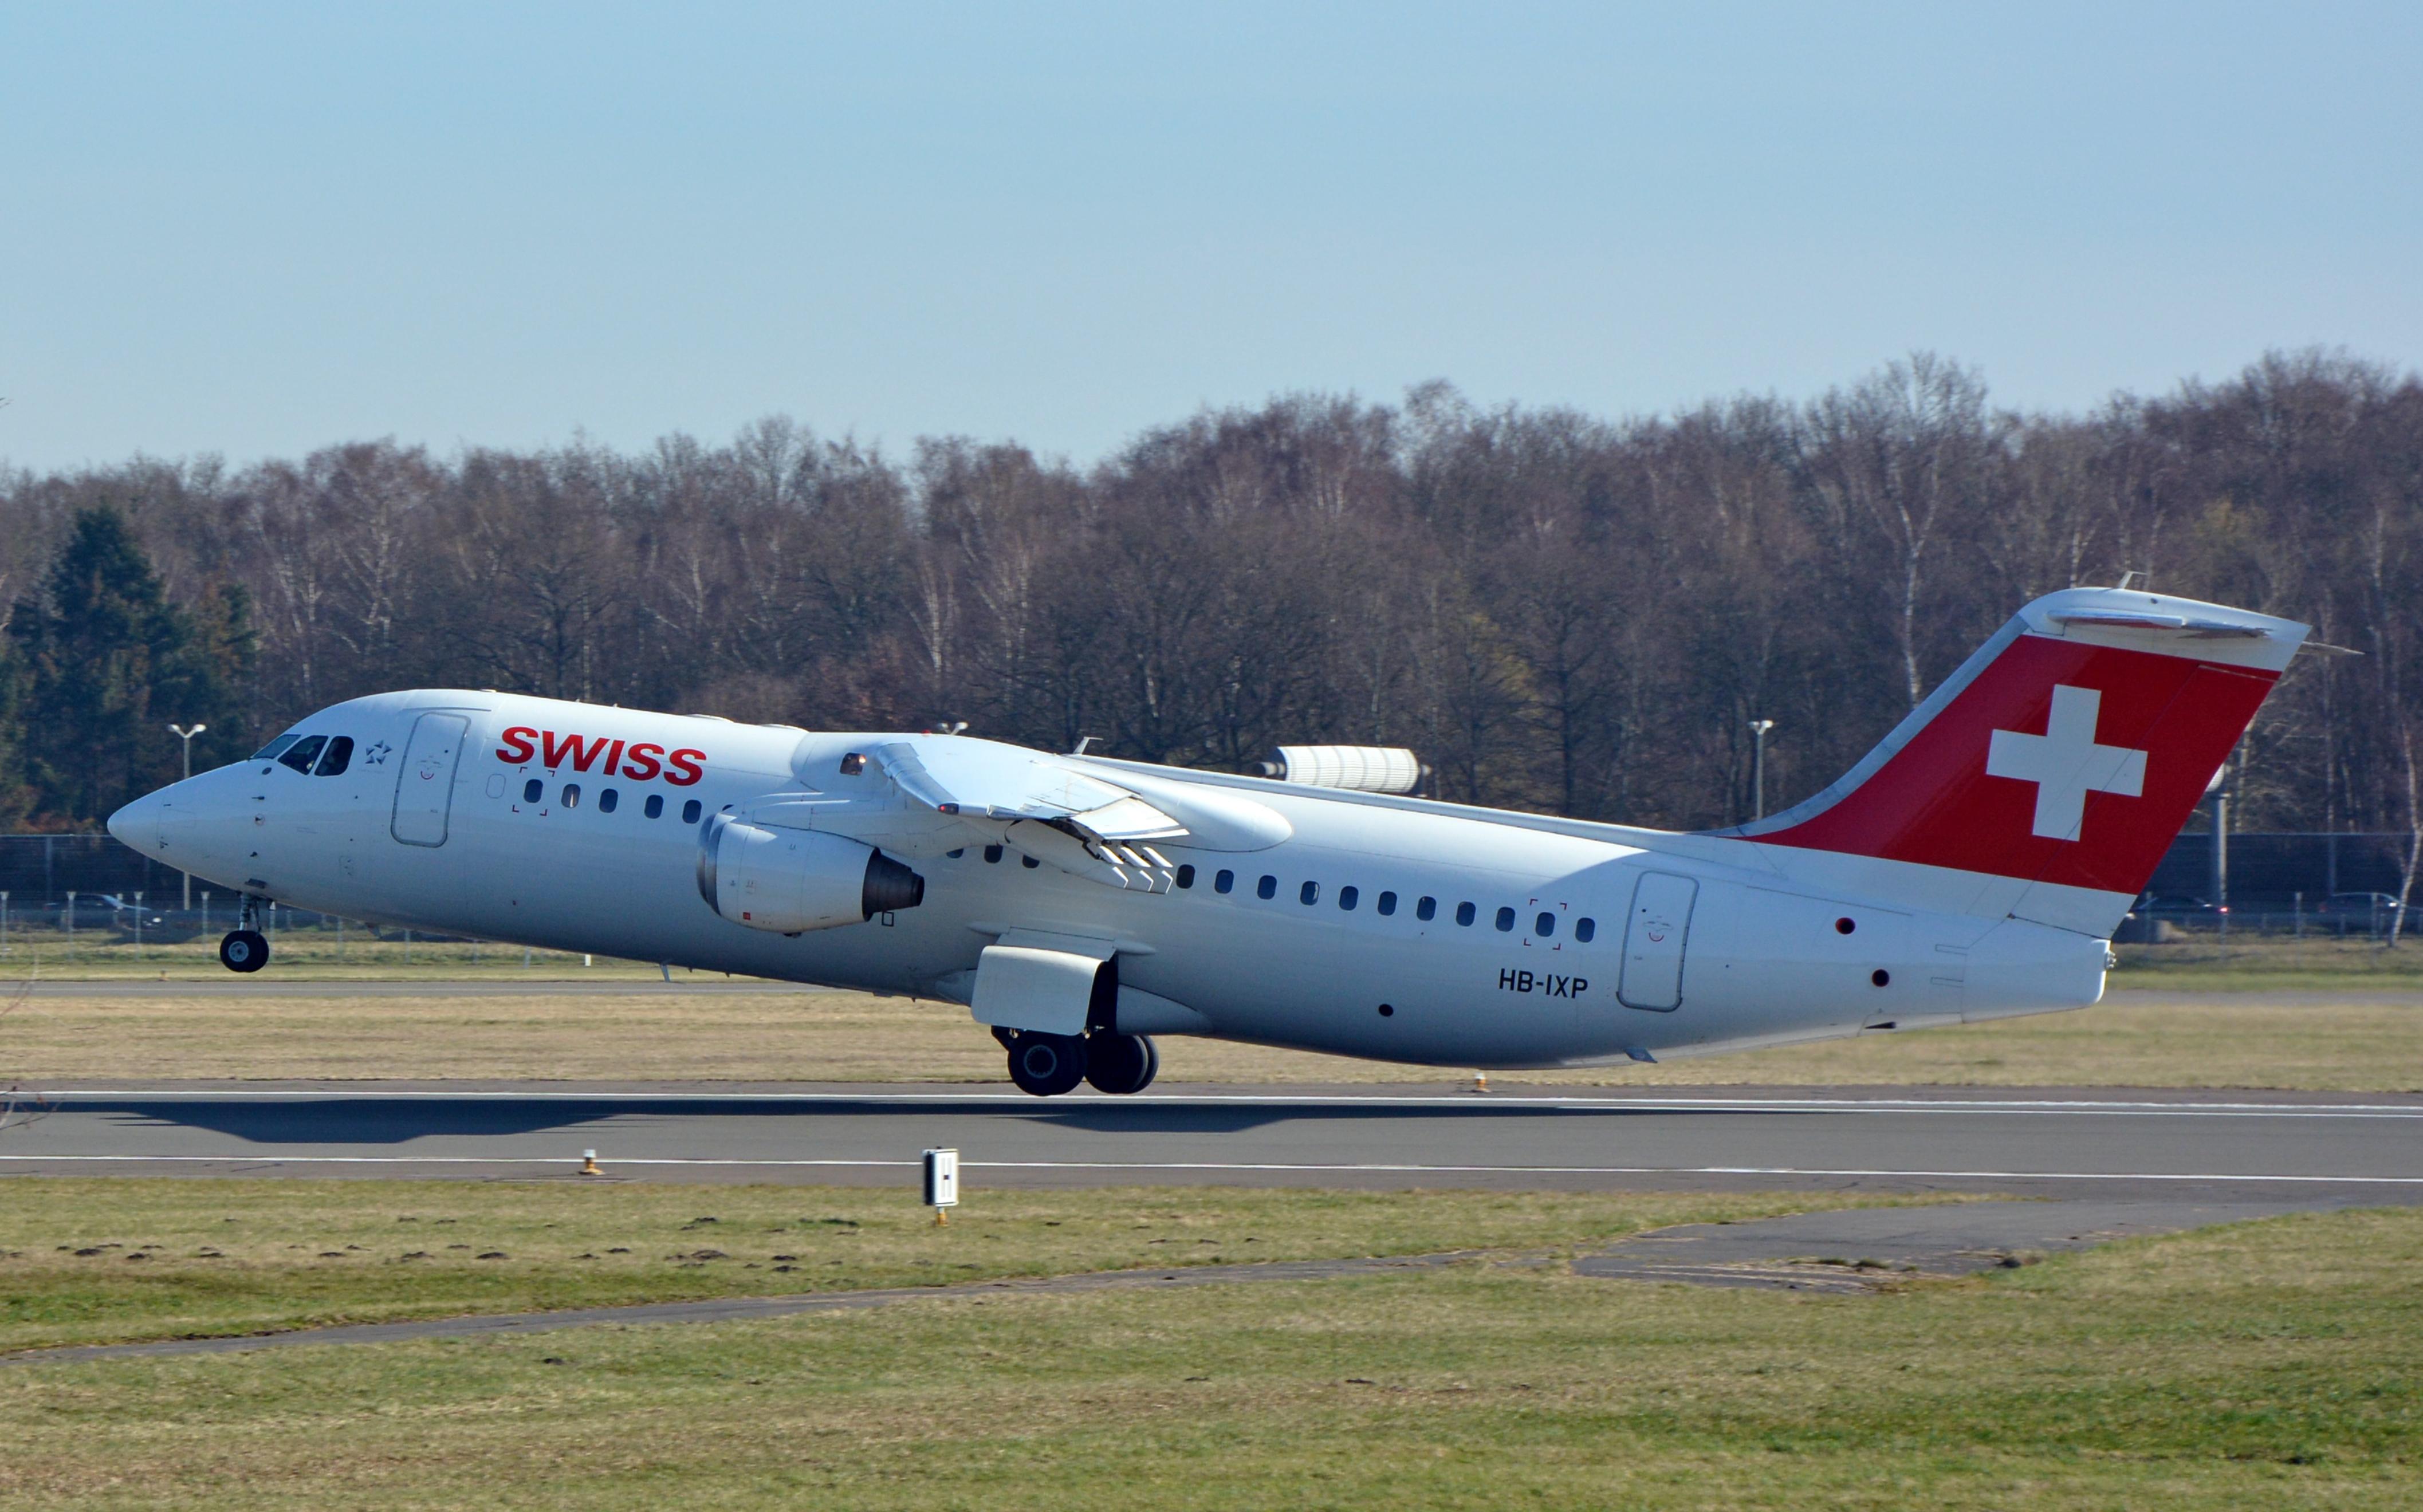 File:Avro Regional Jet RJ100 (HB.